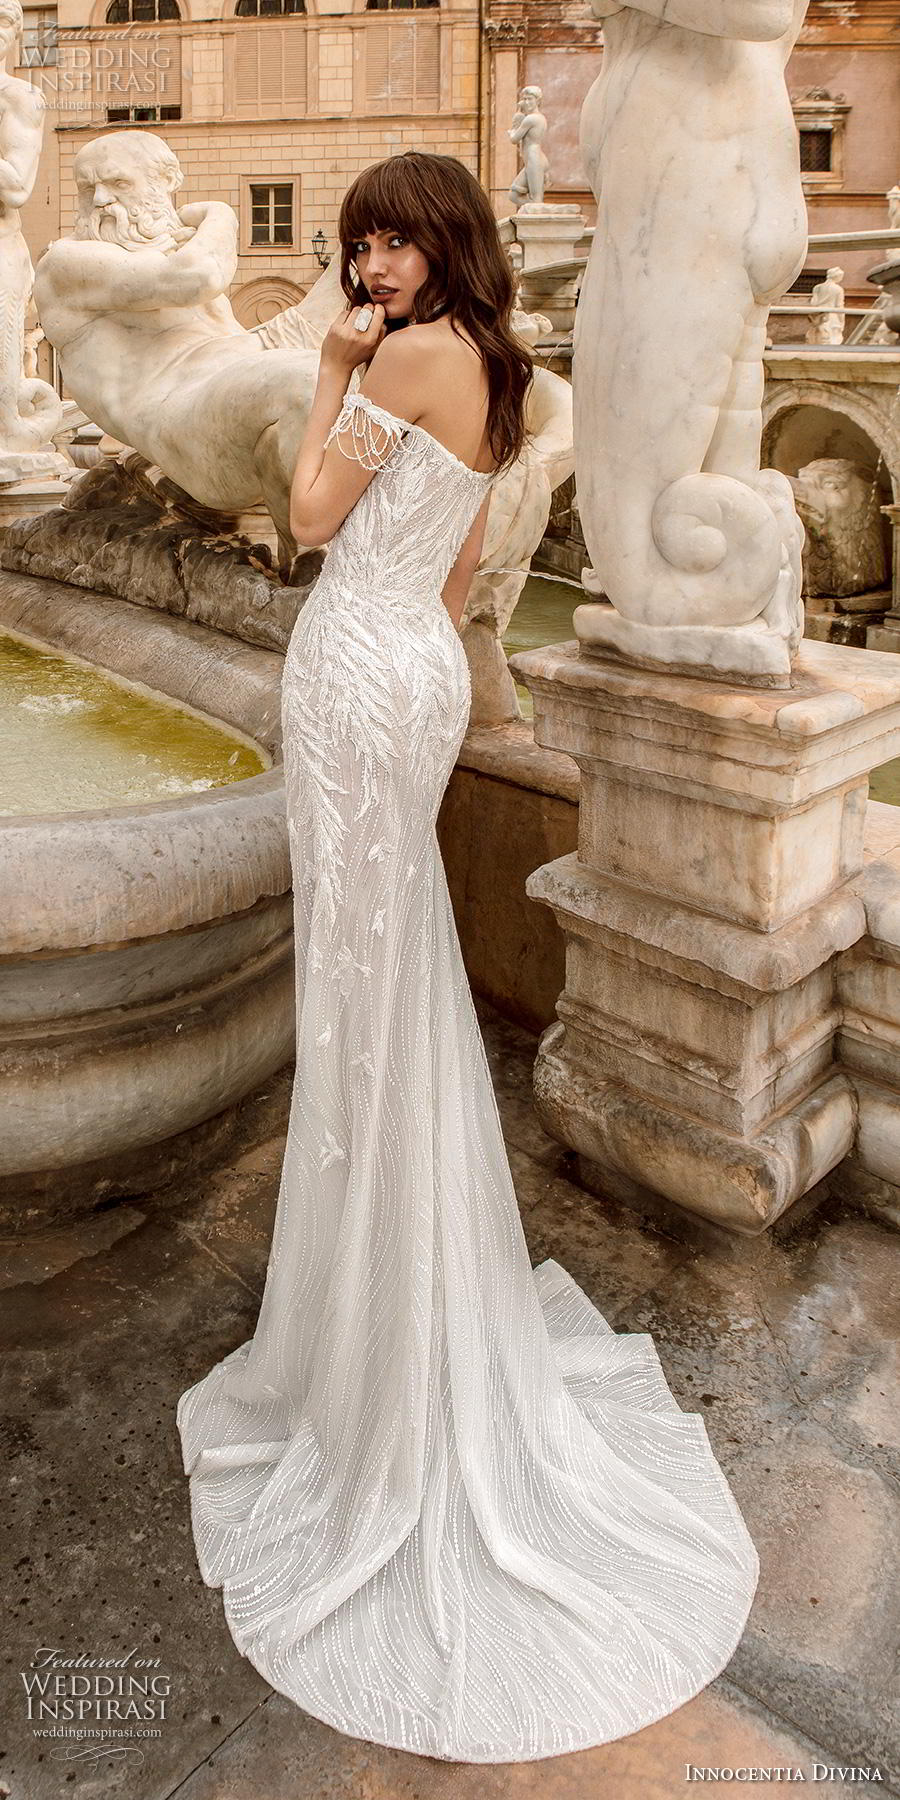 innocentia divina 2020 bridal off the shoulder semi sweetheart neckline elegant sheath wedding dress mid back short train (8) bv